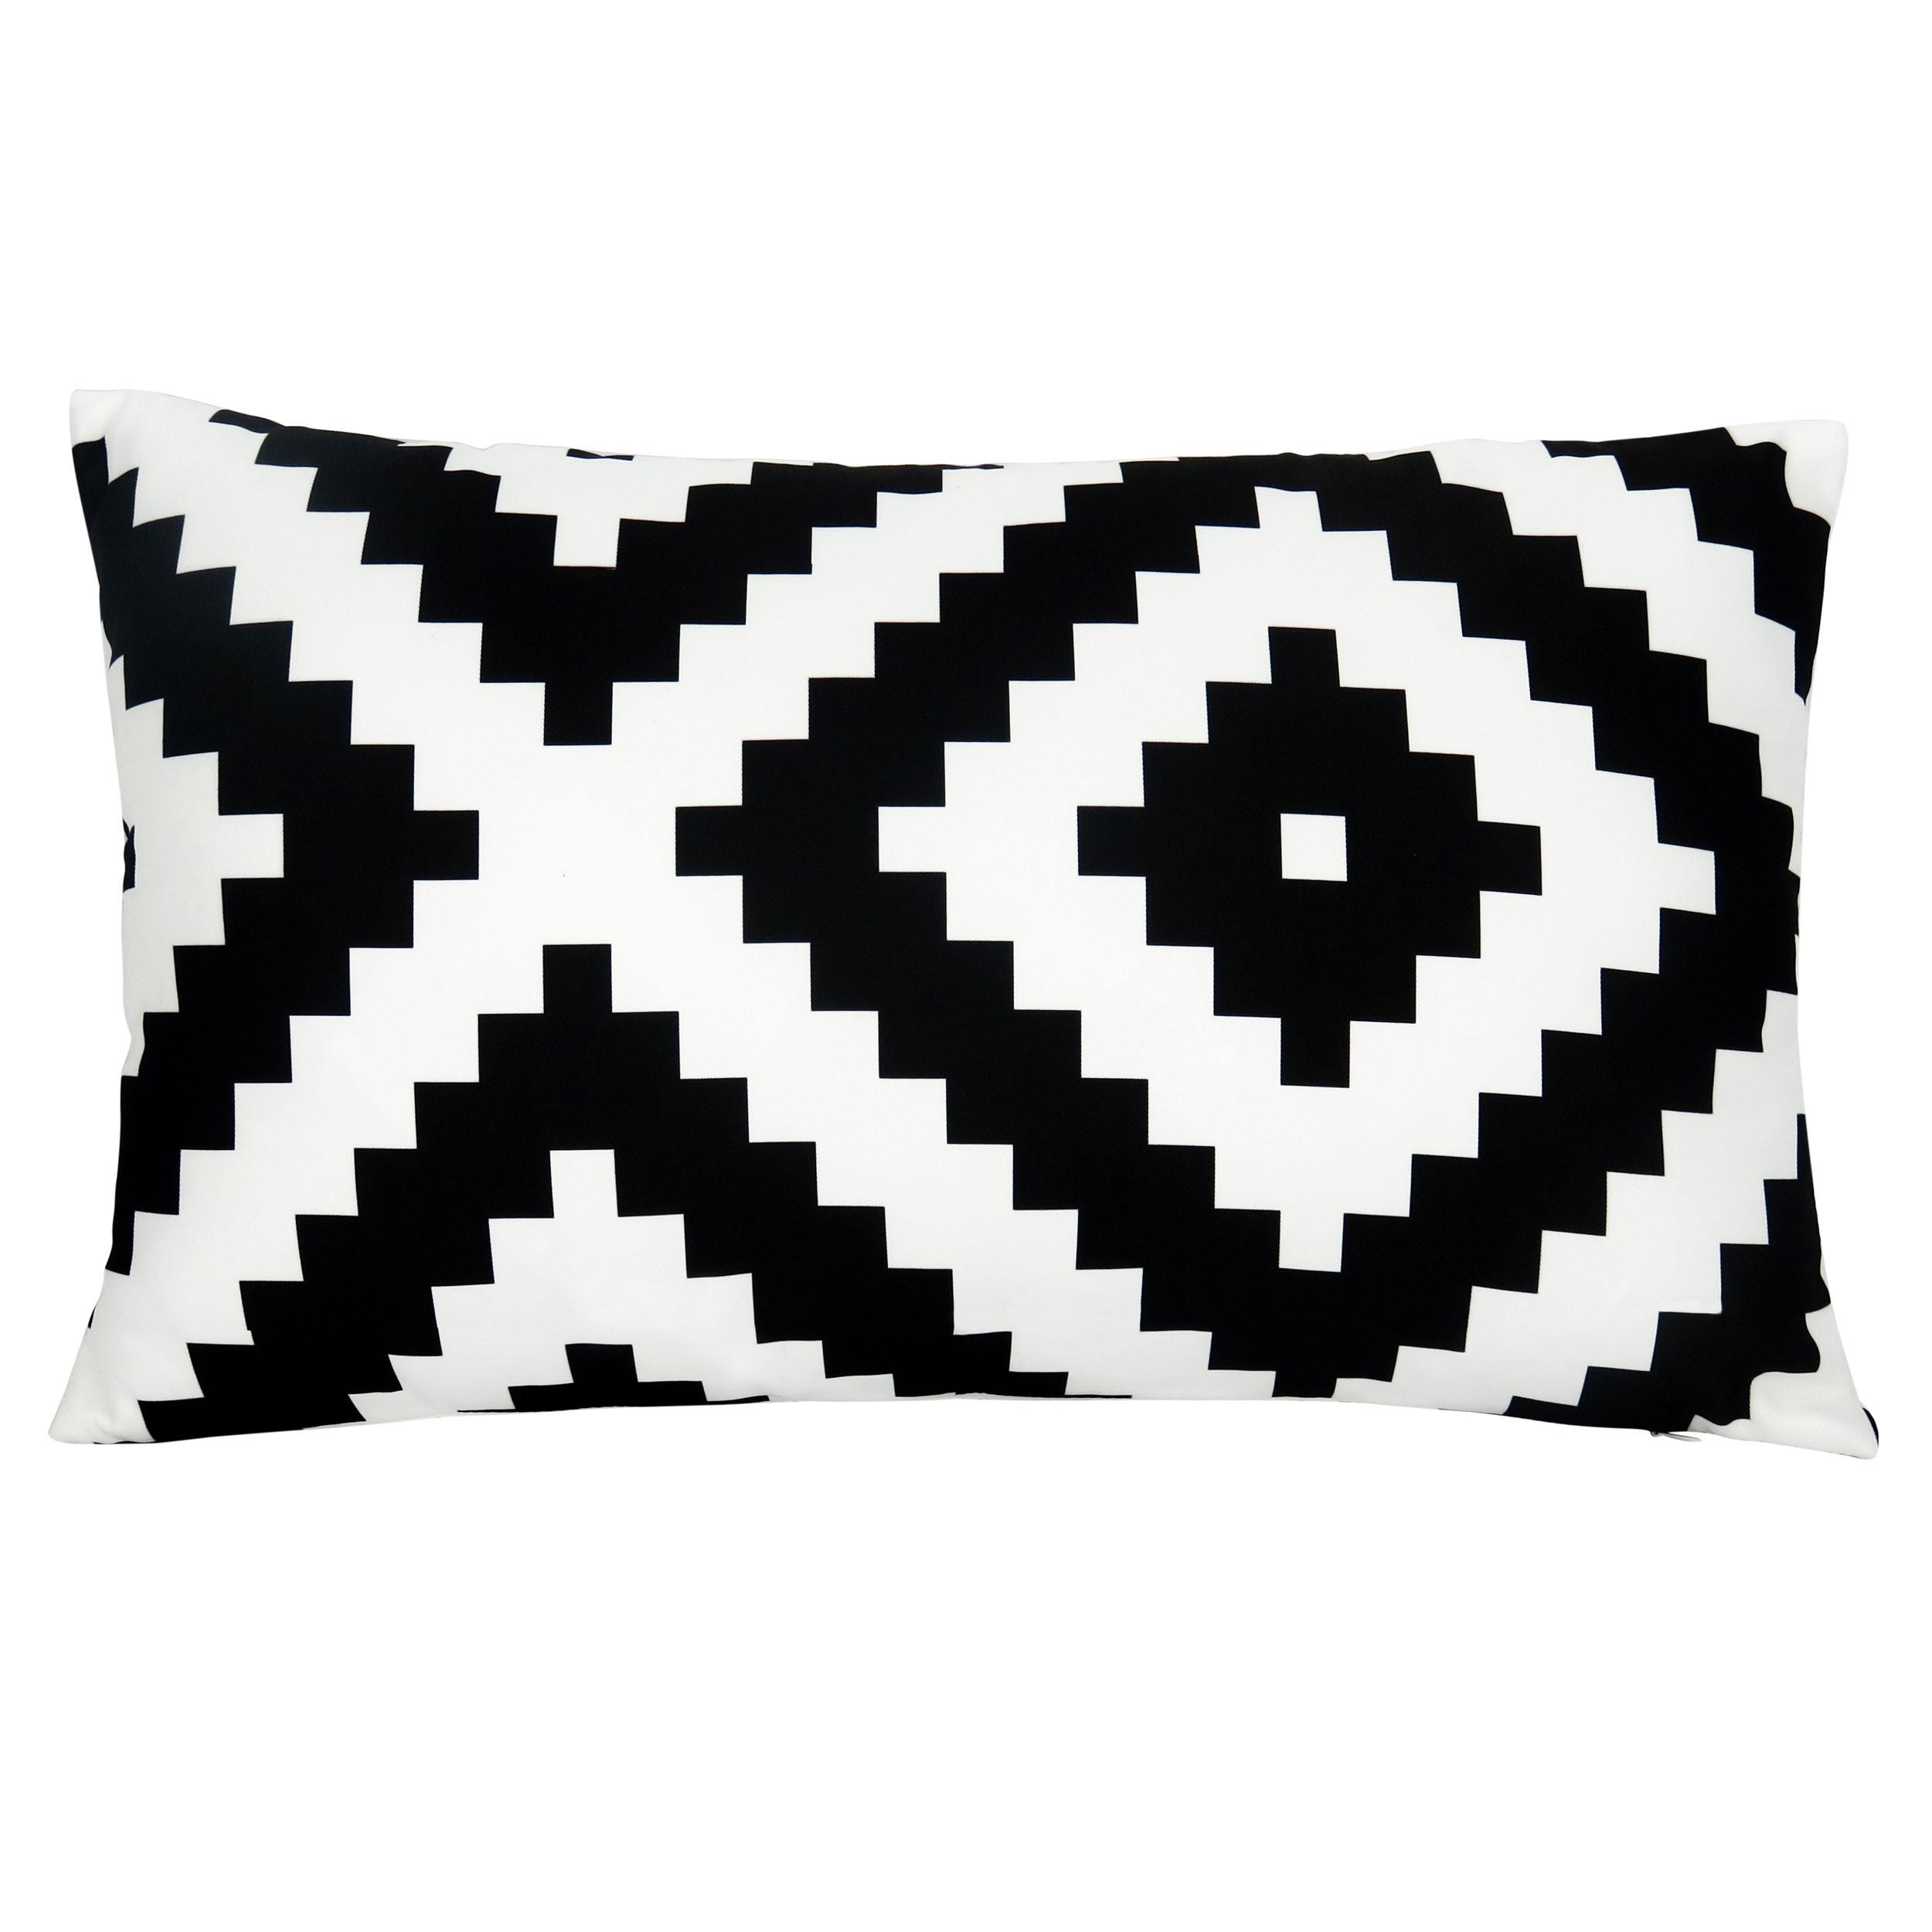 coussin black and white choisissez les coussins black and white design rdv d co. Black Bedroom Furniture Sets. Home Design Ideas